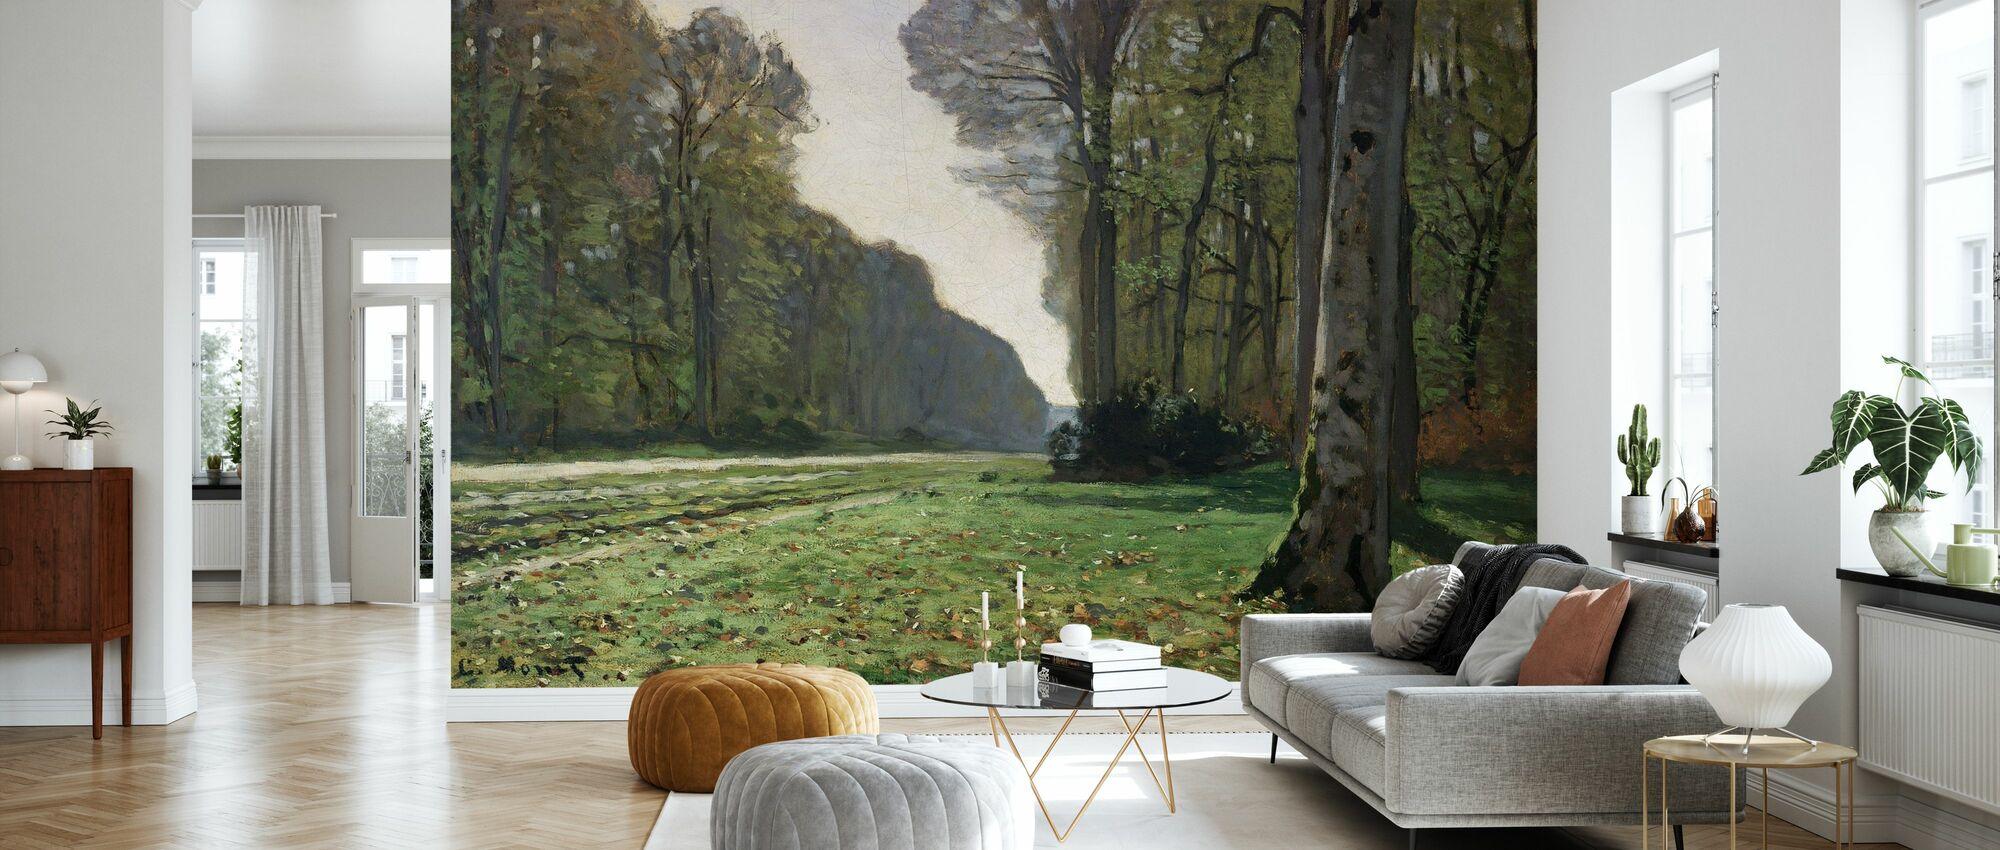 Fontainebleau - Claude Monet - Behang - Woonkamer